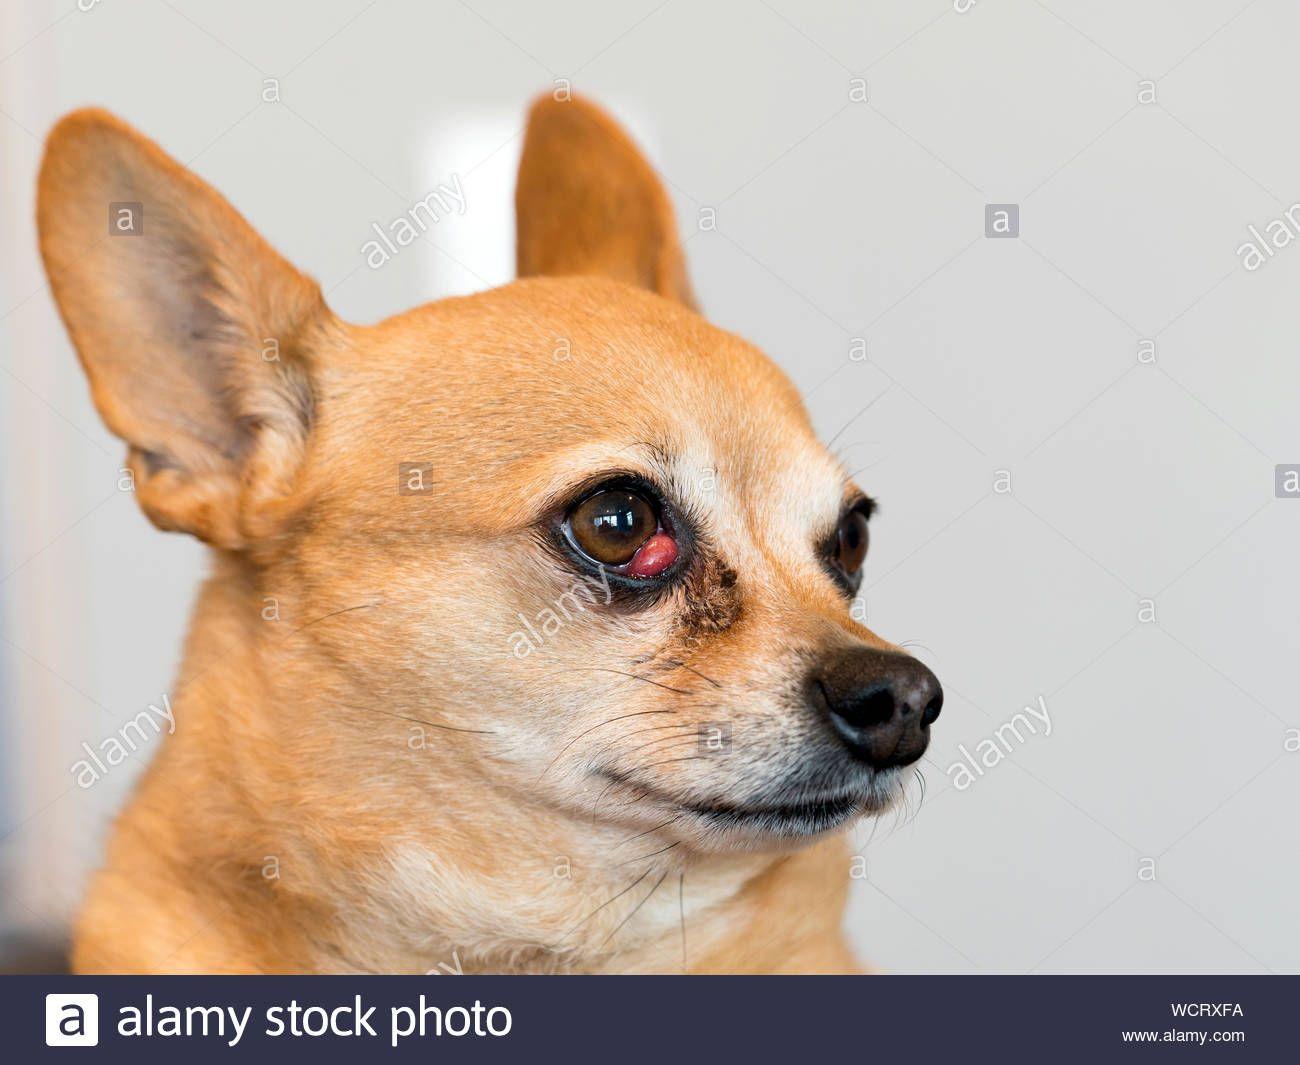 Chihuahua Mix Dachshund Stockfotos Chihuahua Mix Dachshund Seven Of The Most Interesting Chihuahua Breed Mixes In 2020 Chihuahua Mix Chihuahua Breeds Lazy Dog Breeds